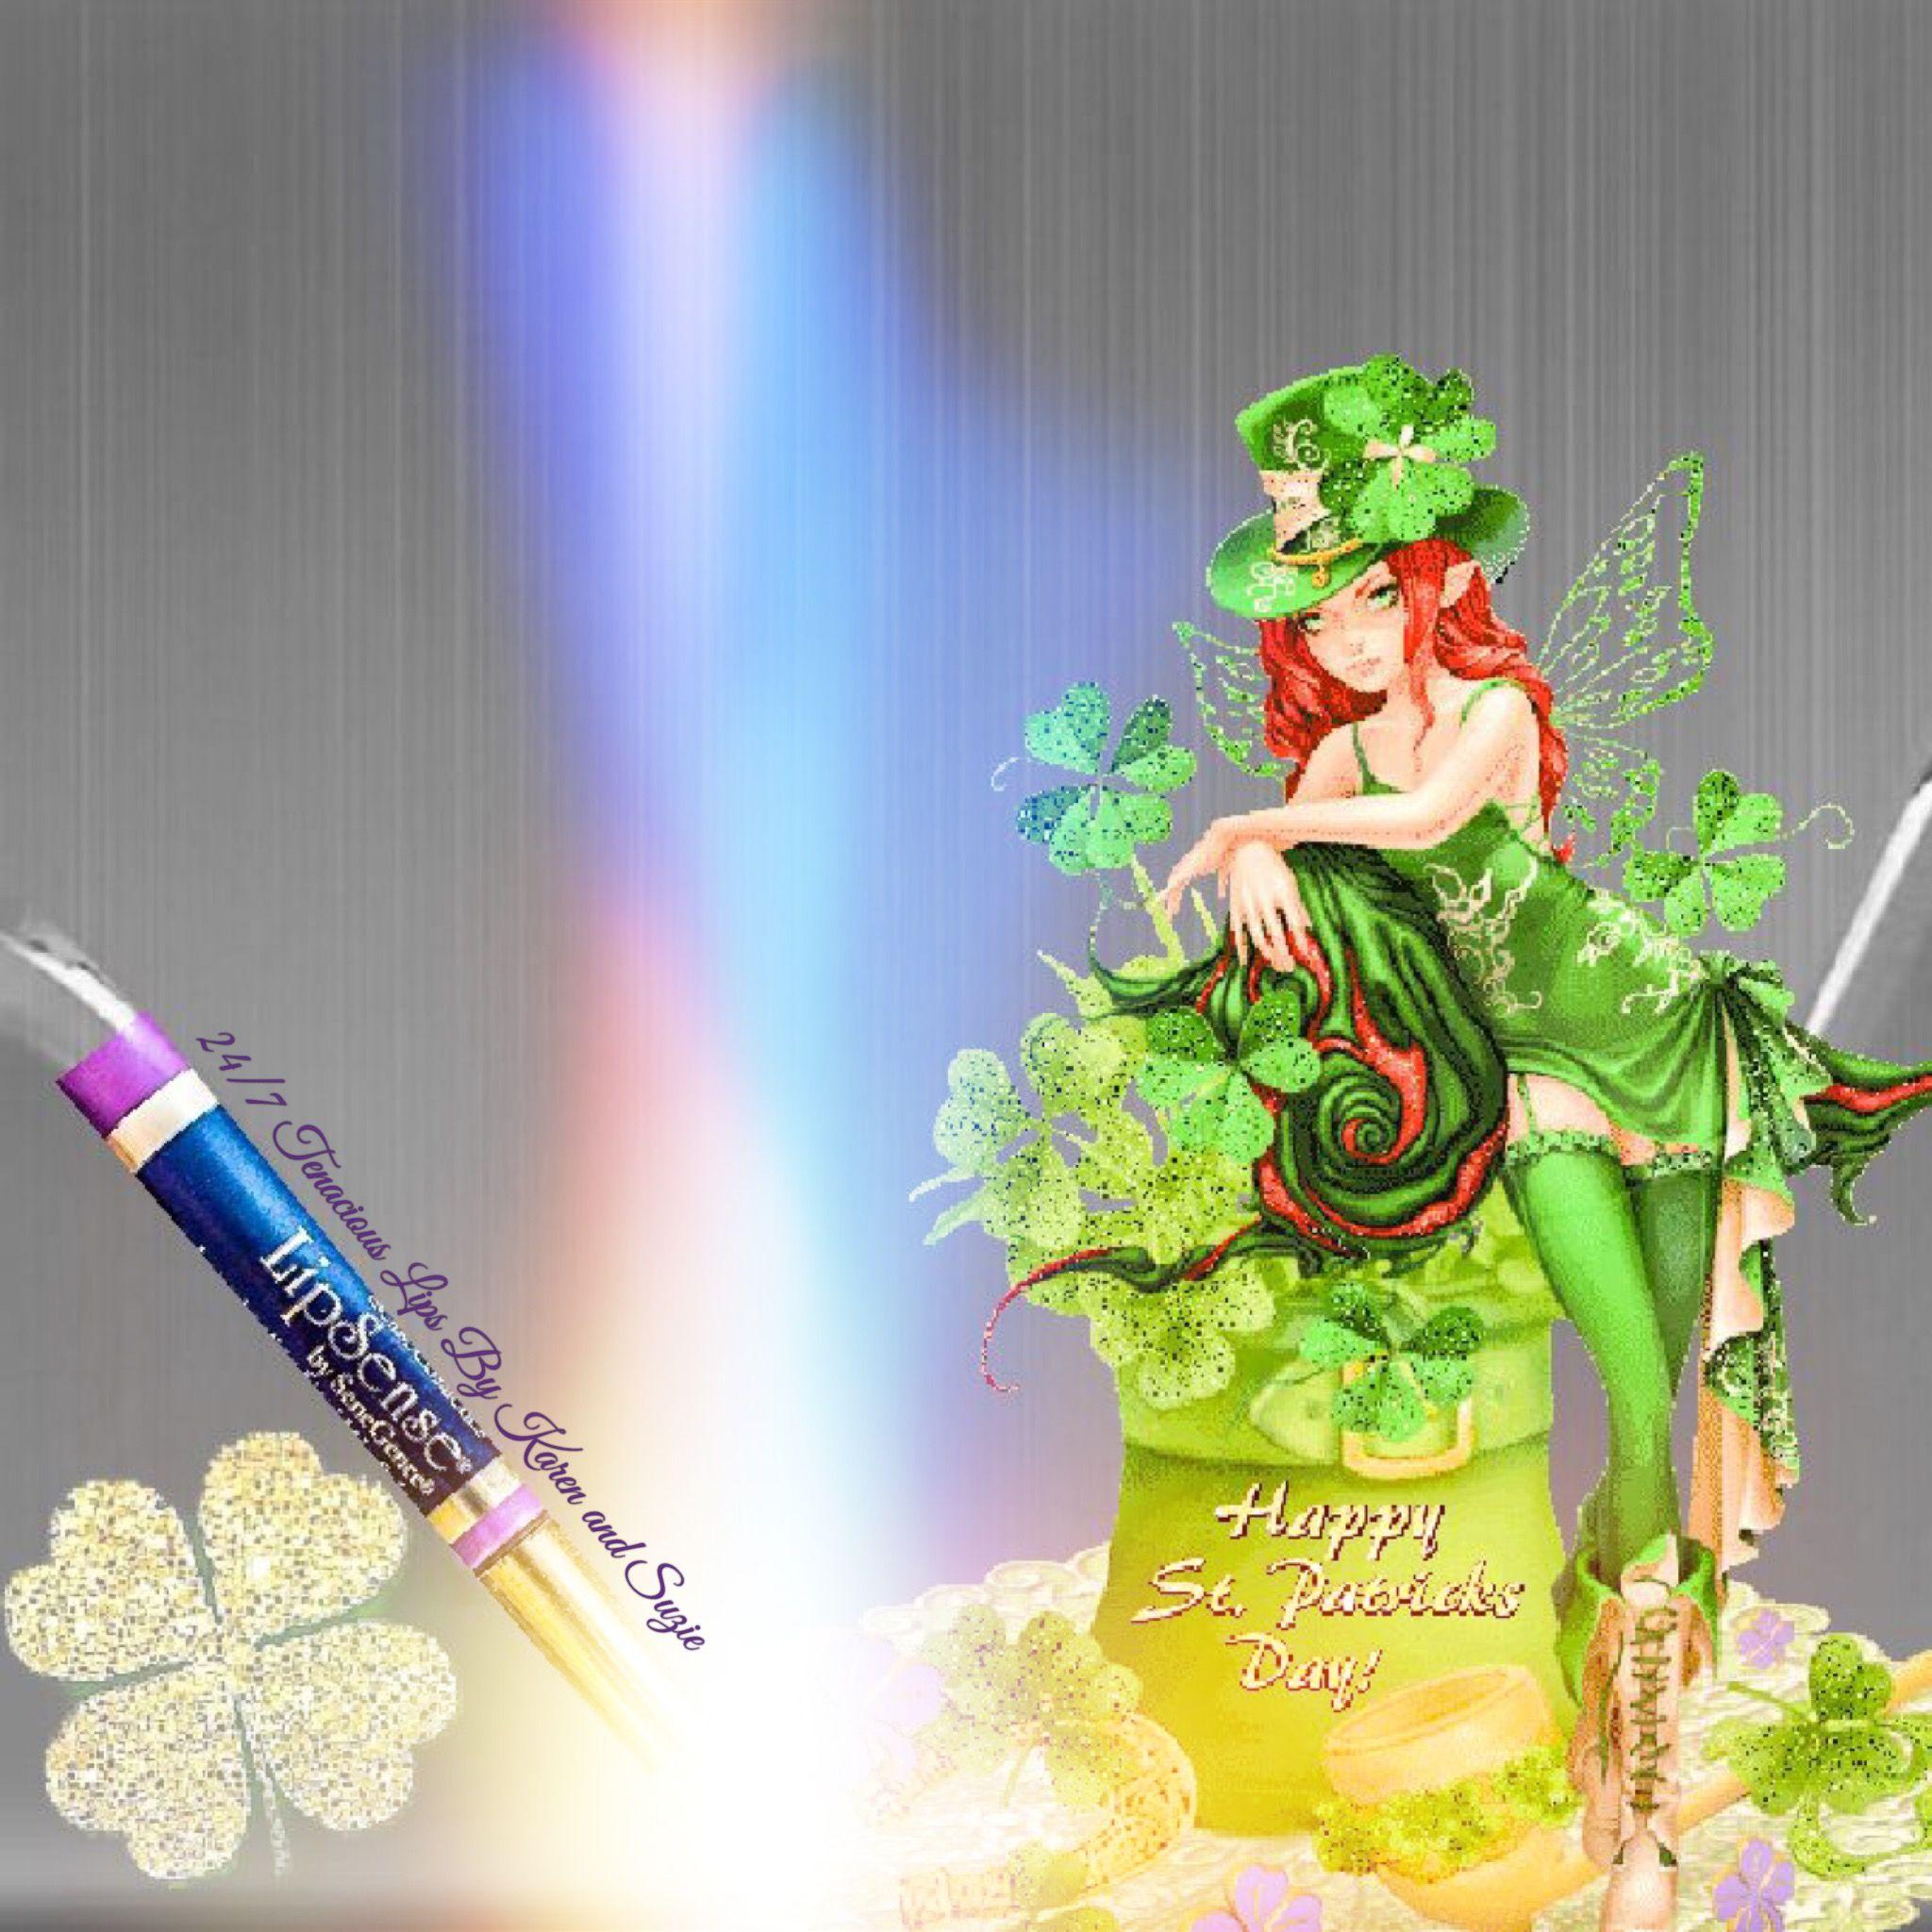 St Patrick's Day Graphic Distributor ID to 24/7 Tenacious